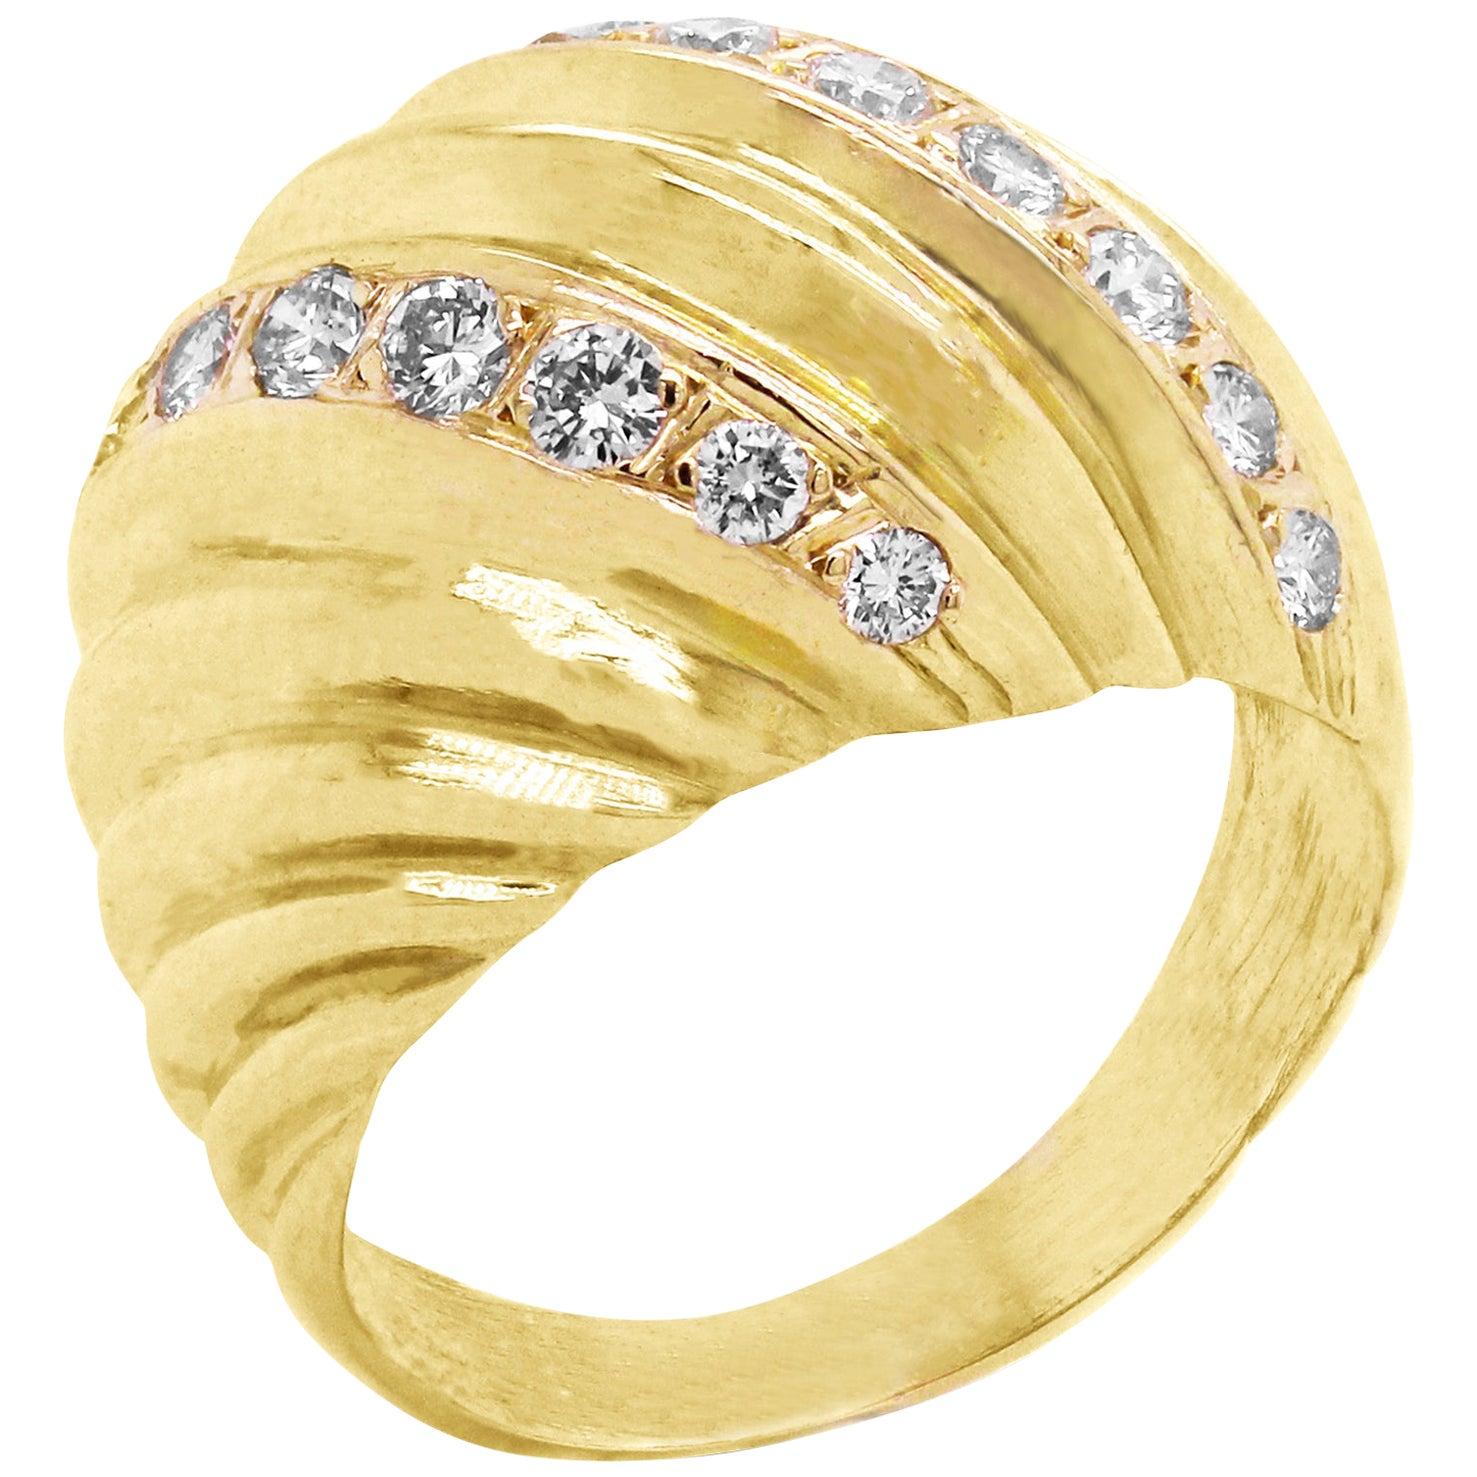 18 Karat Yellow Gold and Diamond Dome Ring